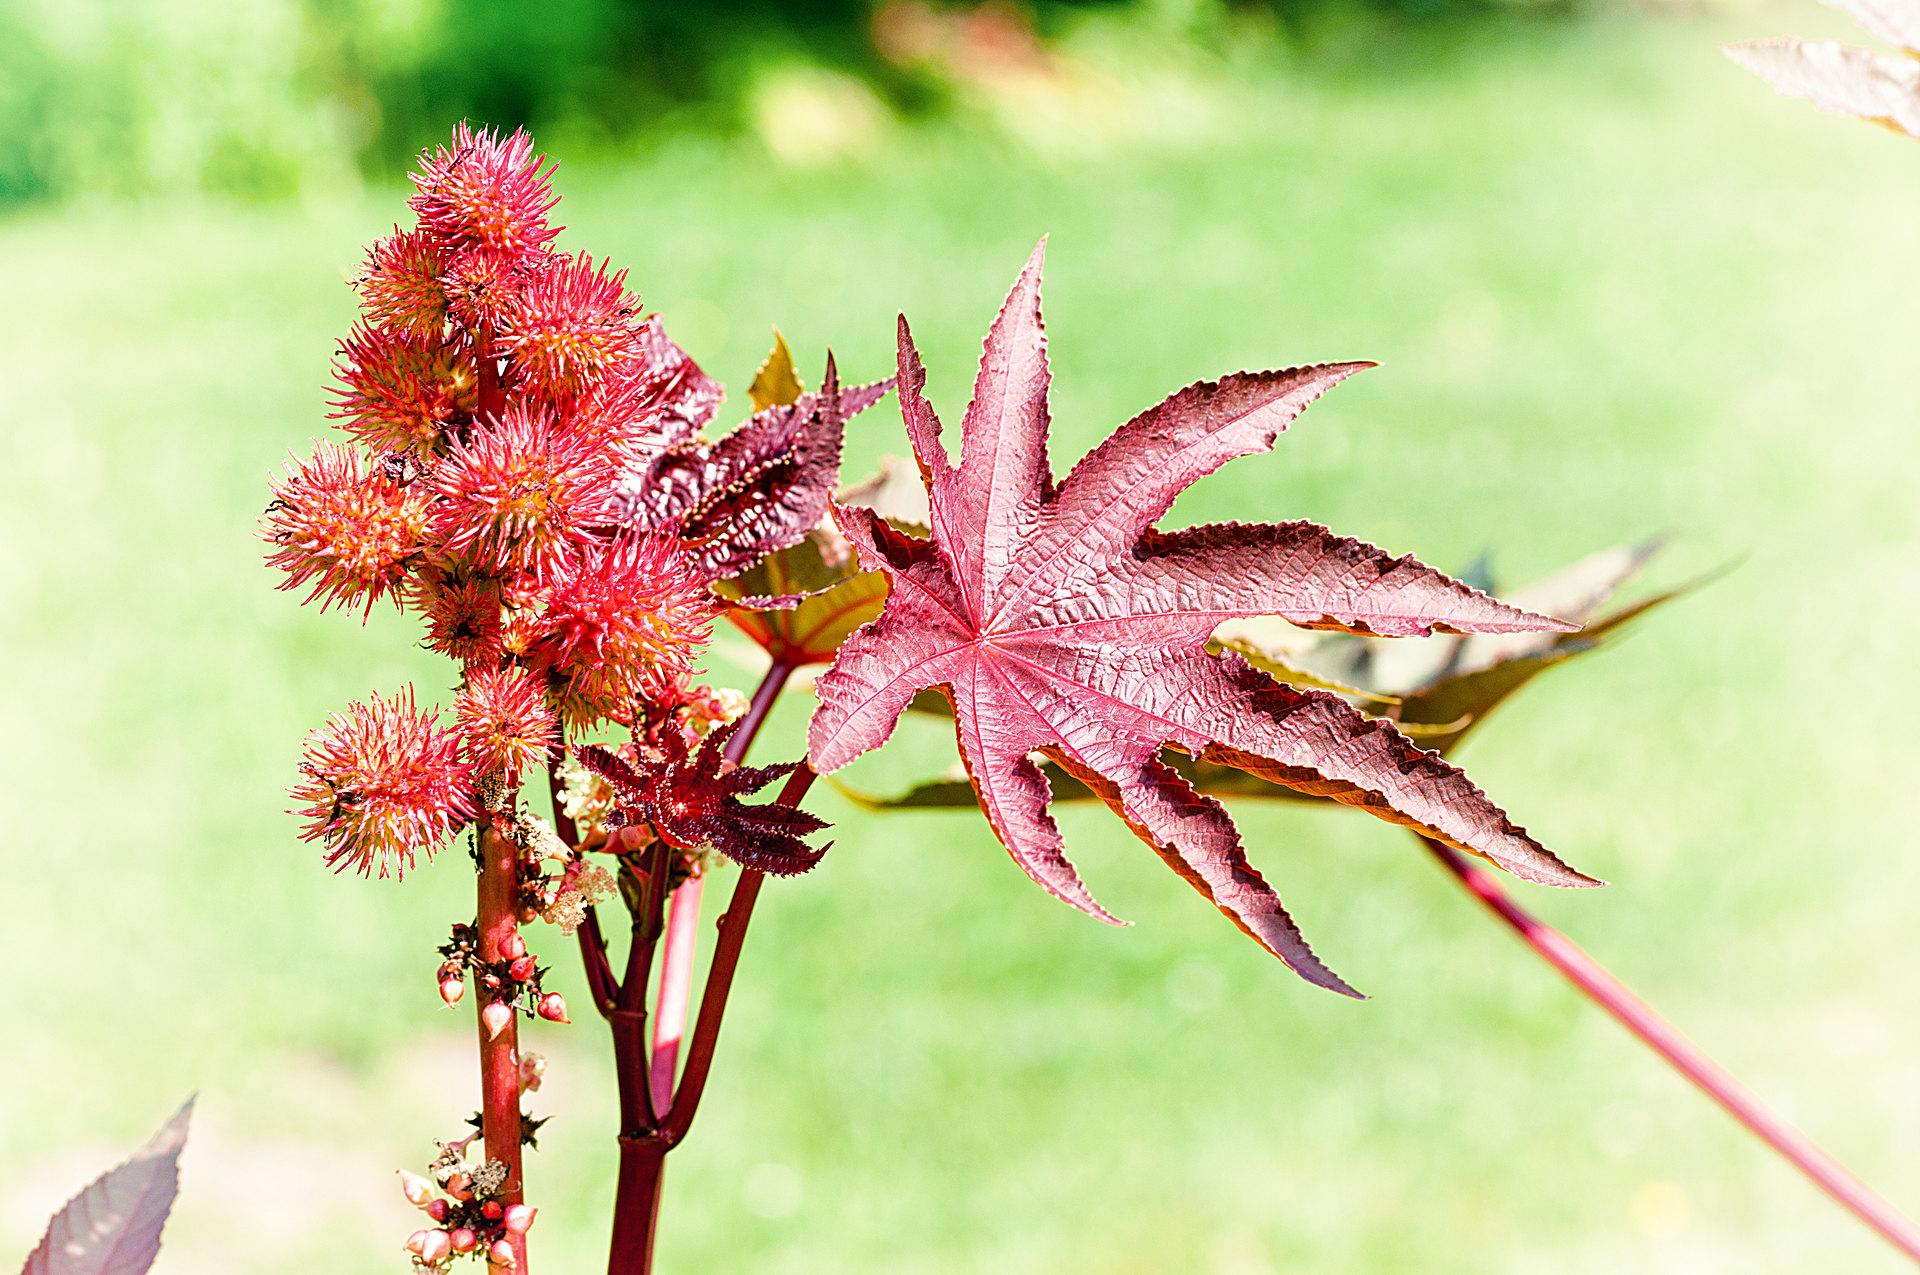 Botanischer garten darmstadt fotos botanischer garten - Garten fotos ...